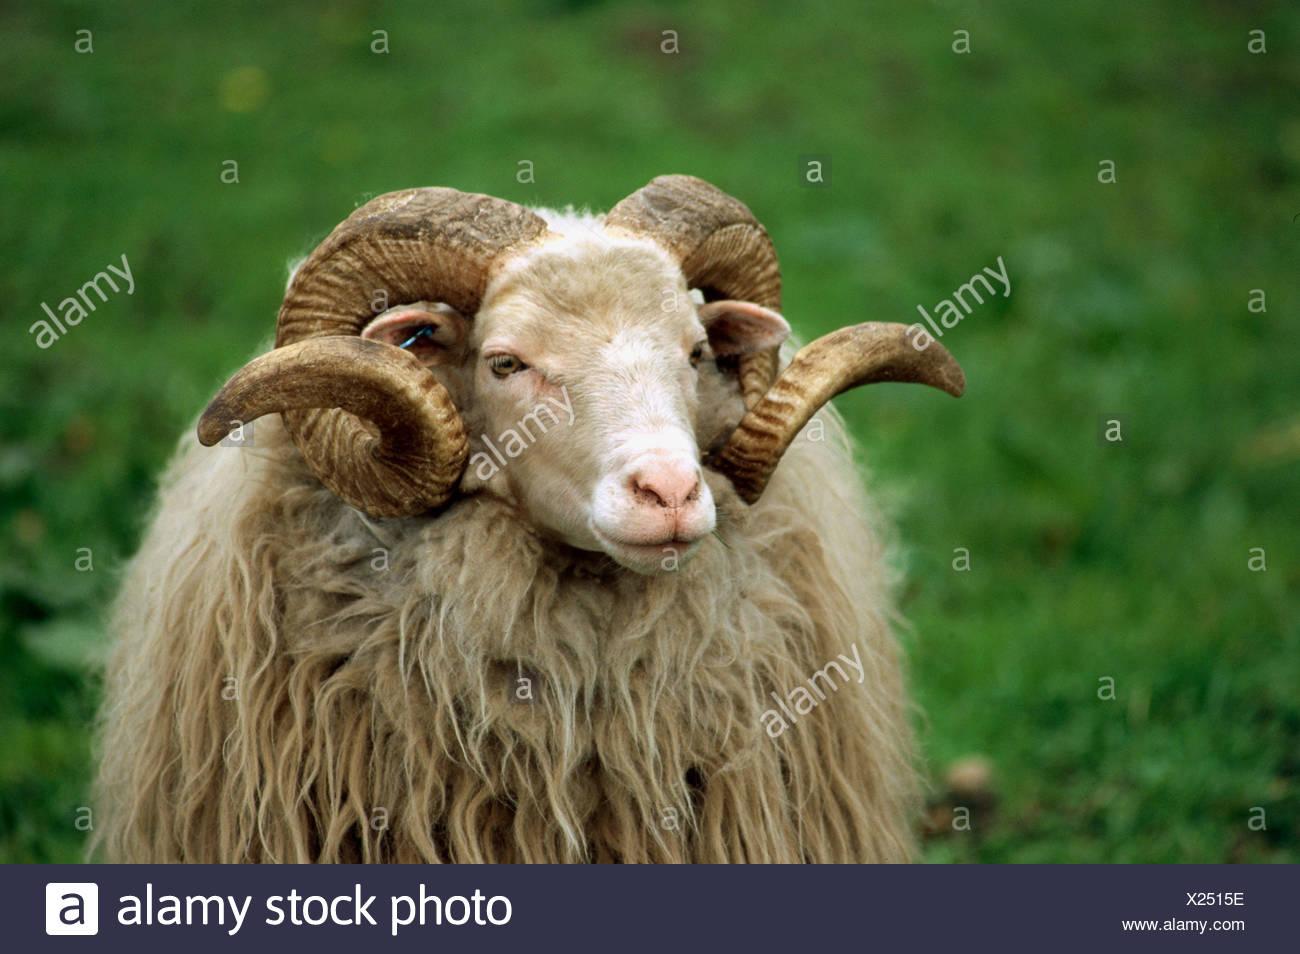 zoology / animals, mammal / mammalian, sheep, (Ovis), Walachian sheep, detail: head, distribution: Slovakia, Czech Republic, Ger - Stock Image